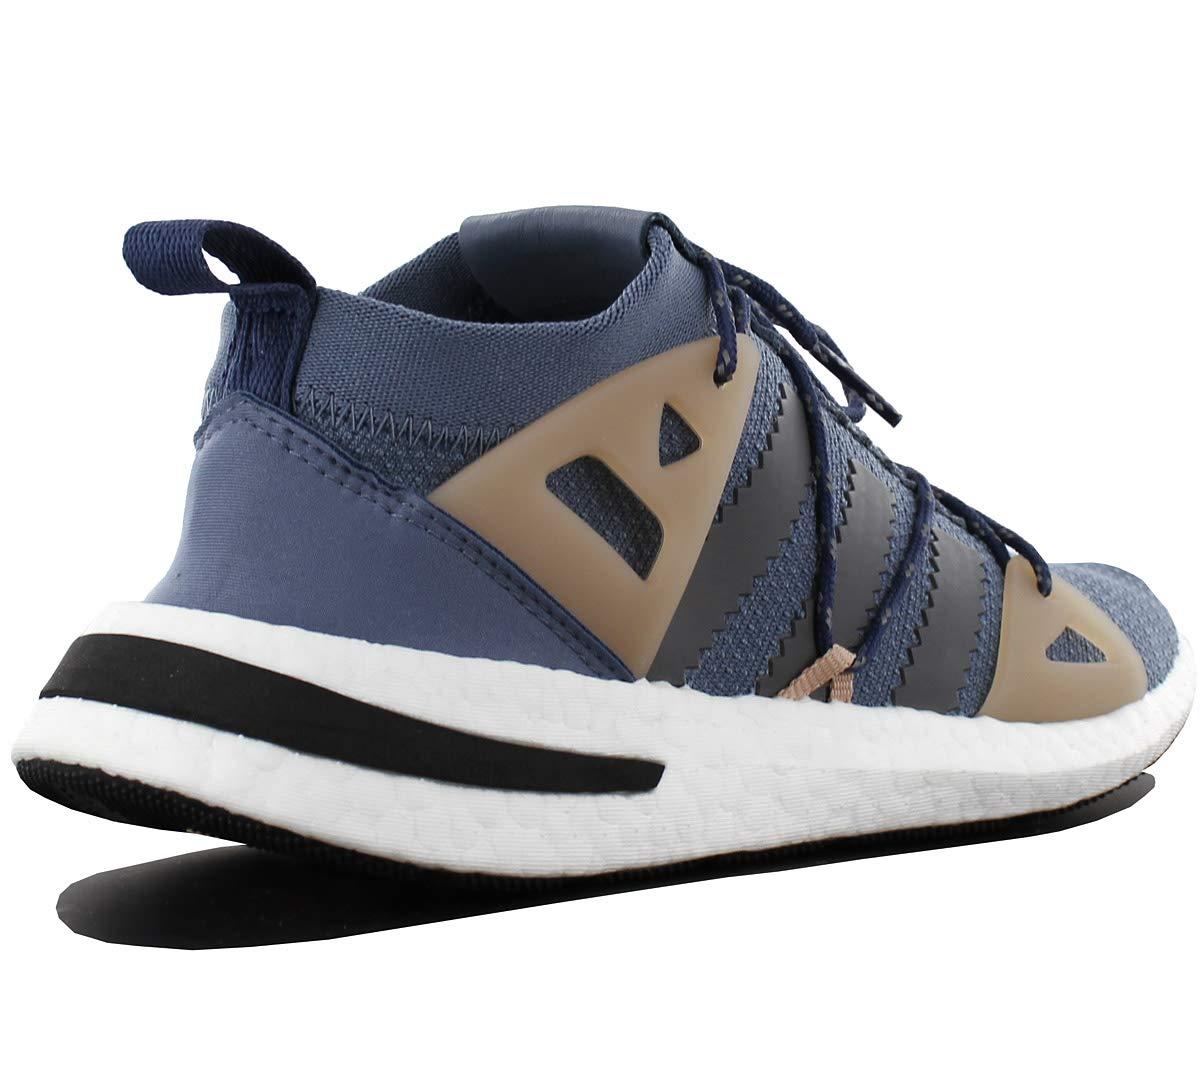 monsieur / madame adidas arkyn les w, femmes de couleur, les arkyn femmes, ftwbla / ftwbla /% prix fou, birmingham prix optimal prix préférentiel vr15471 e8568e